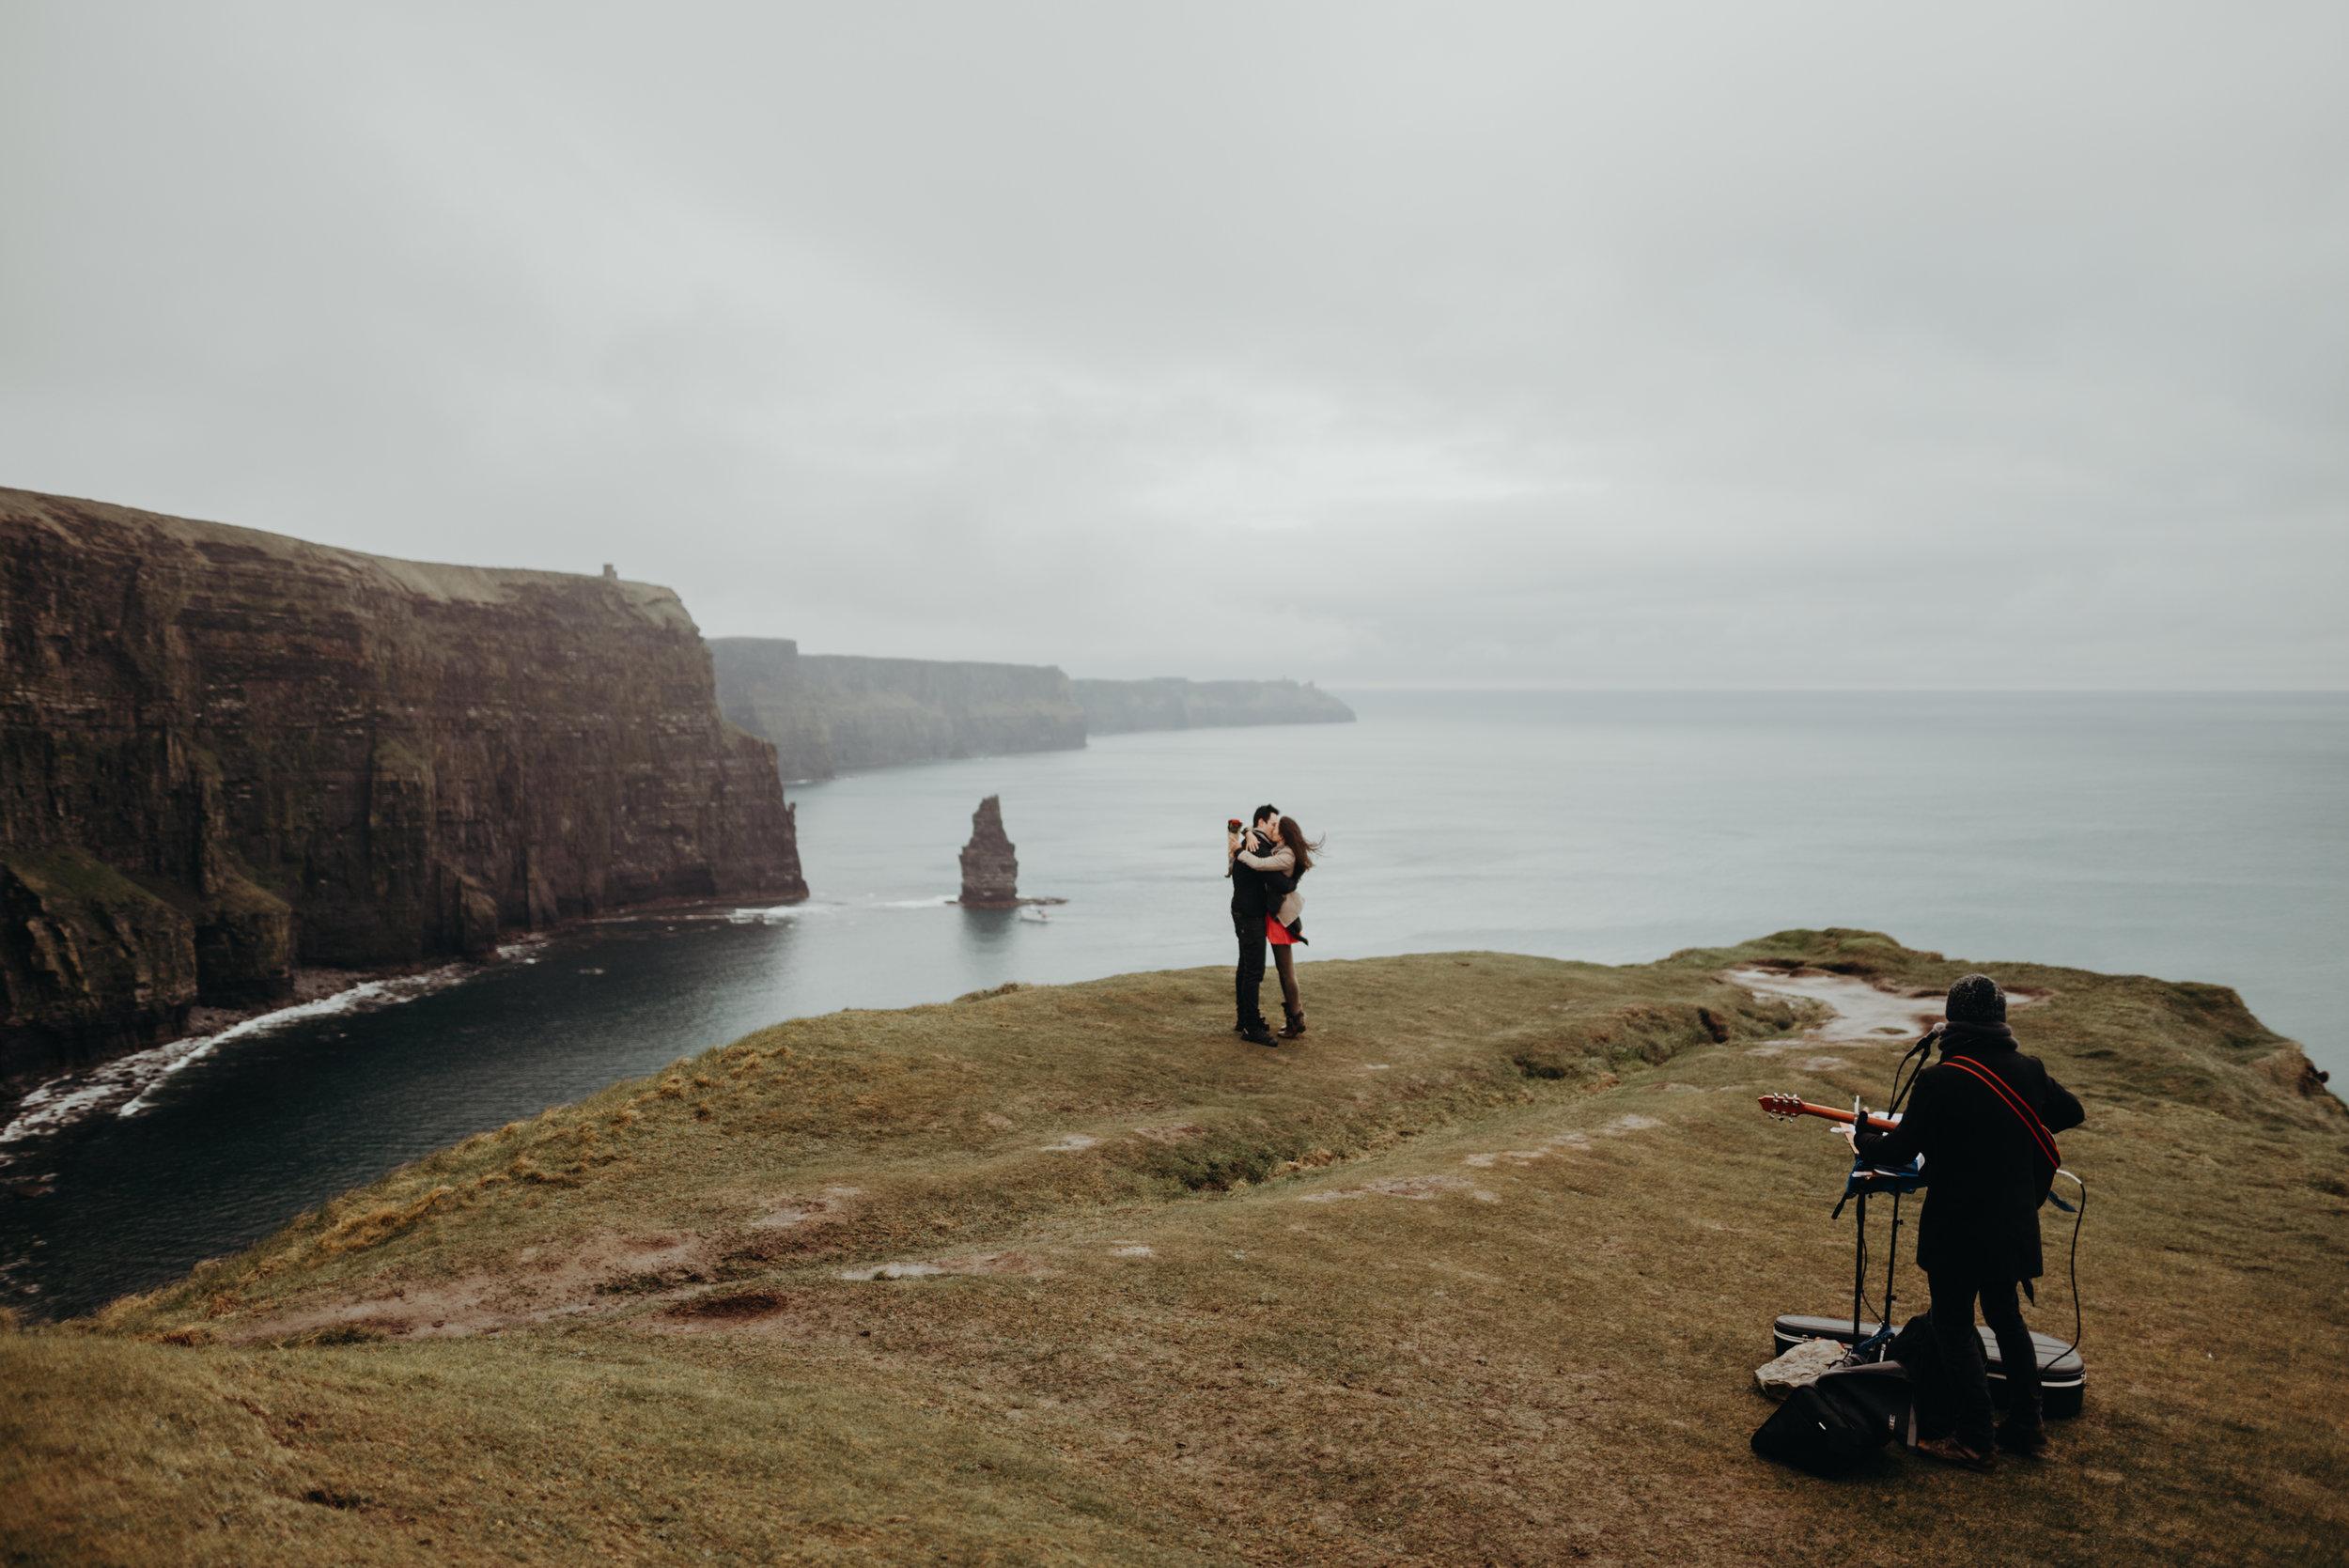 Cliffs Of Moher Engagement Session - Cliffs of Moher Proposal - Cliffs of Mhoer Elopement_5301-Edit-6.jpg